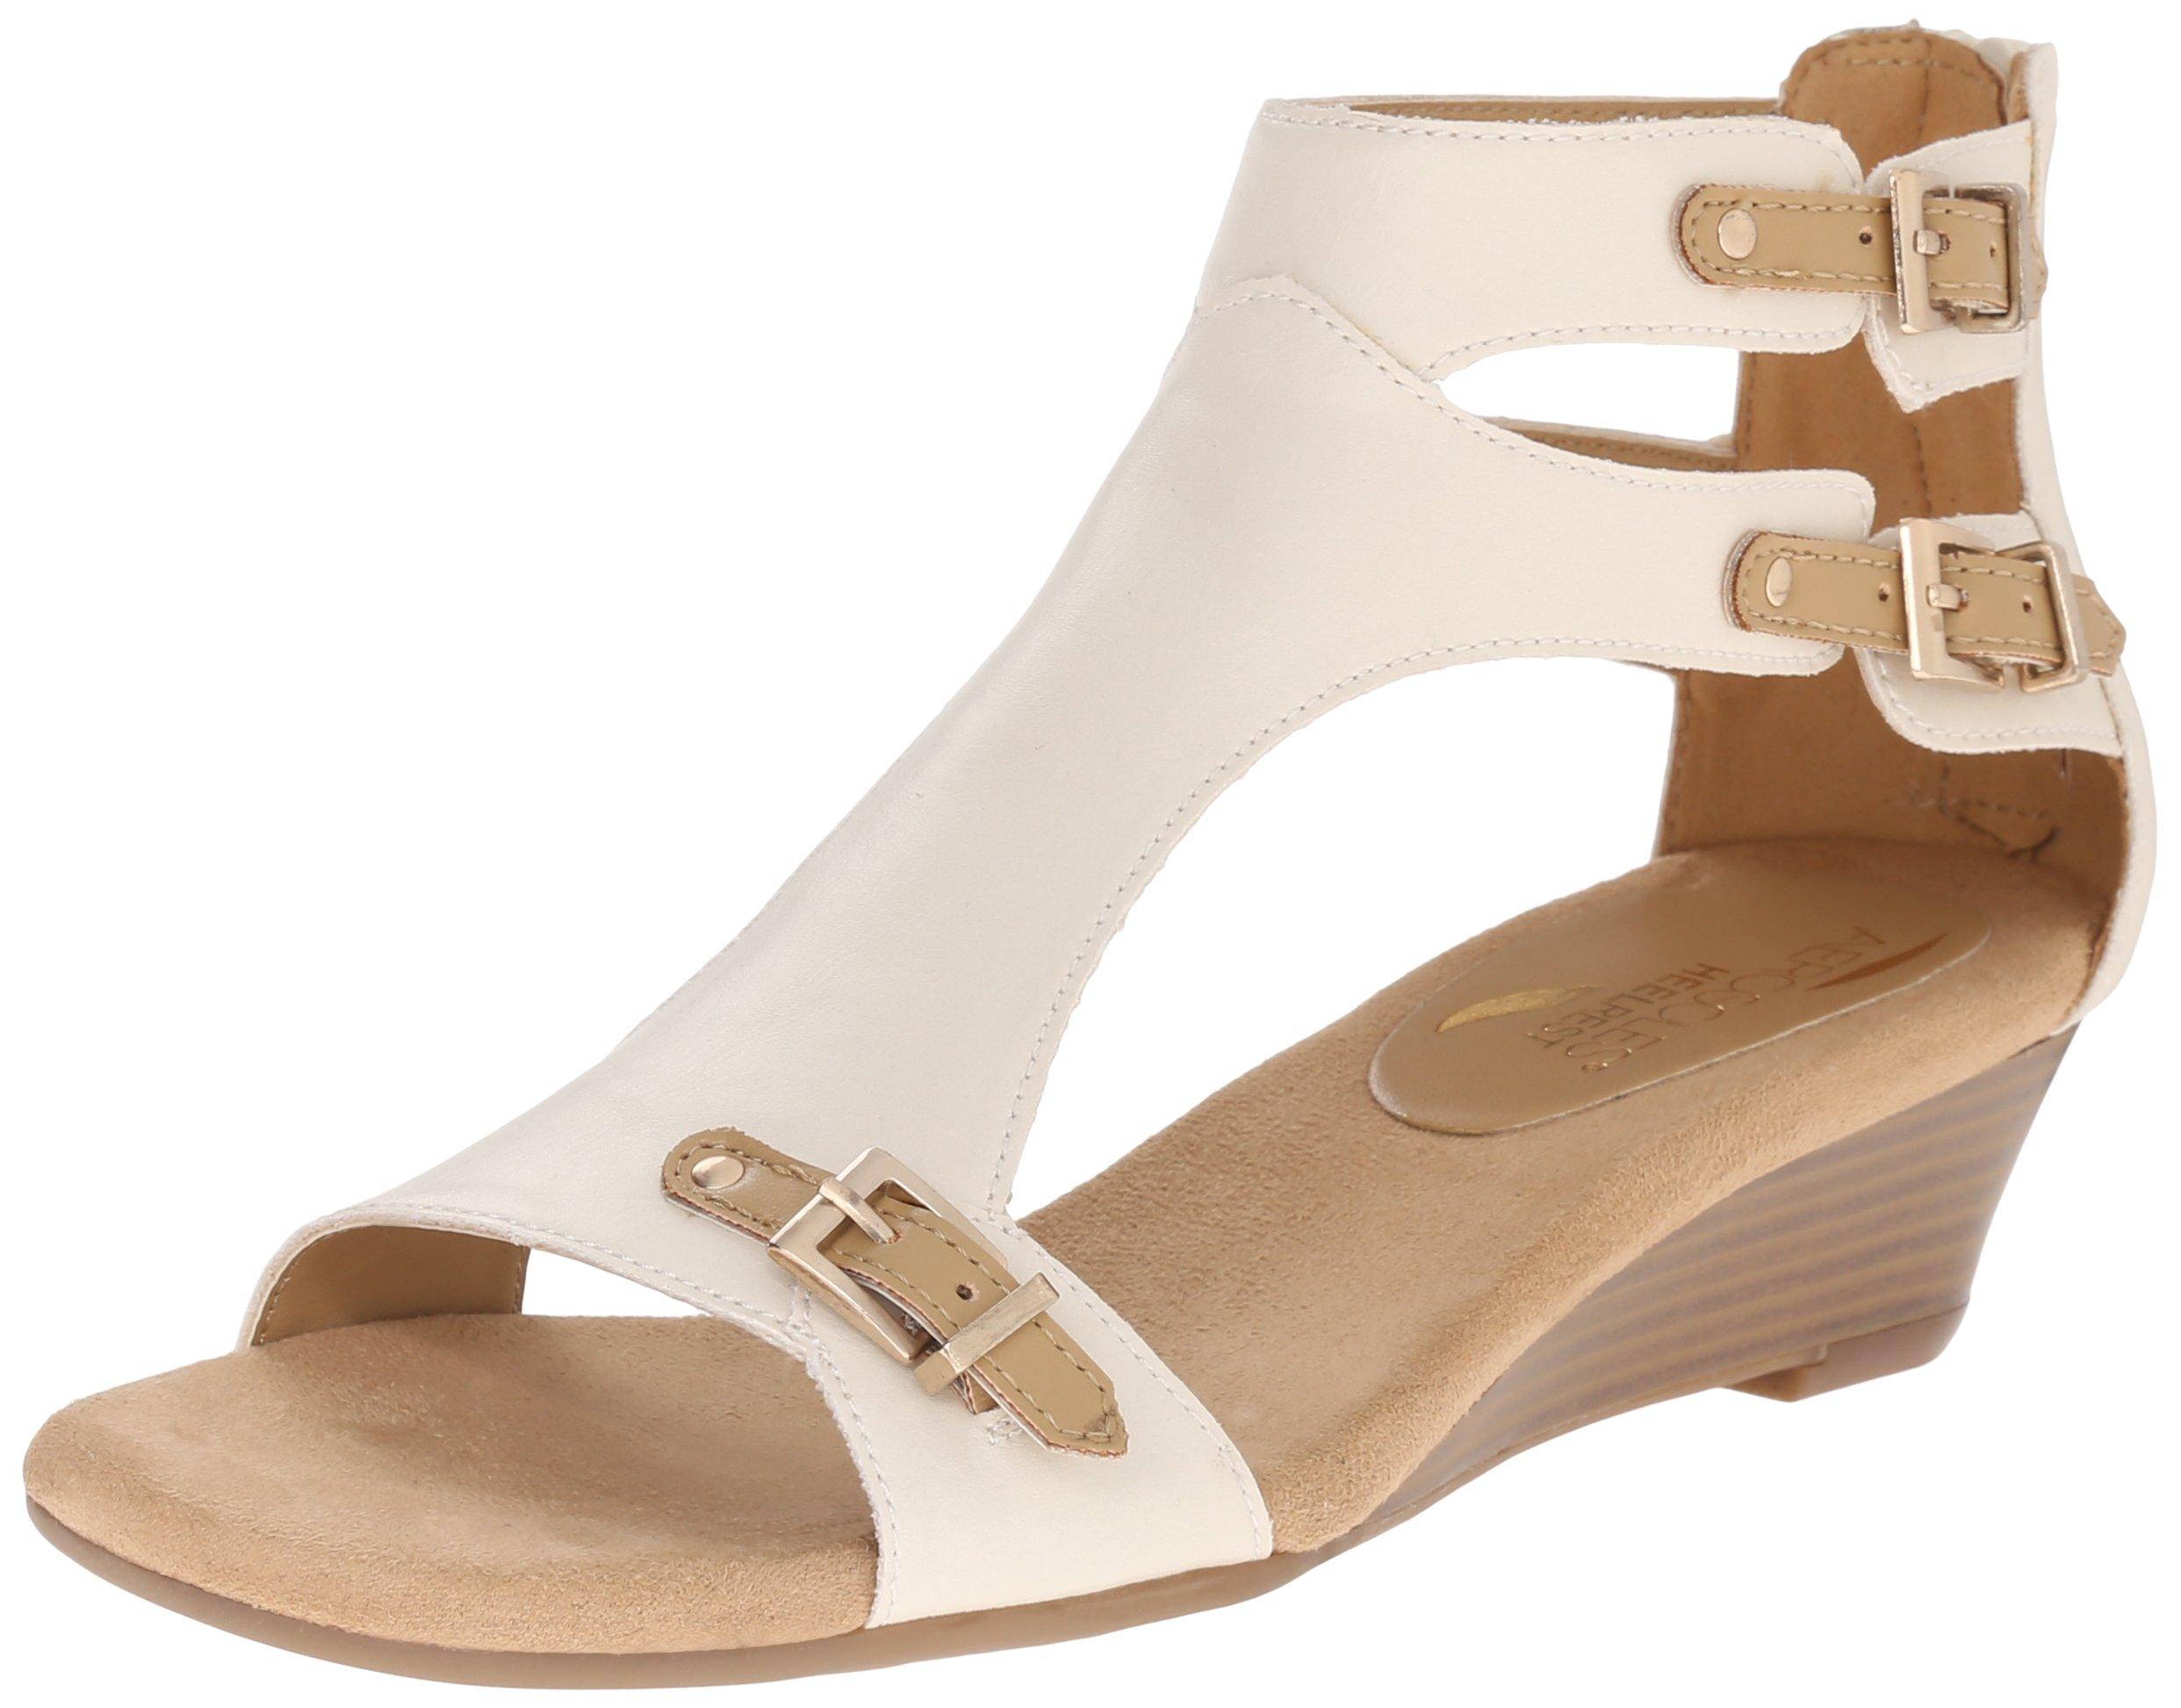 Aerosoles Women's YET Another Wedge Sandal, Bone Combo, 12 M US